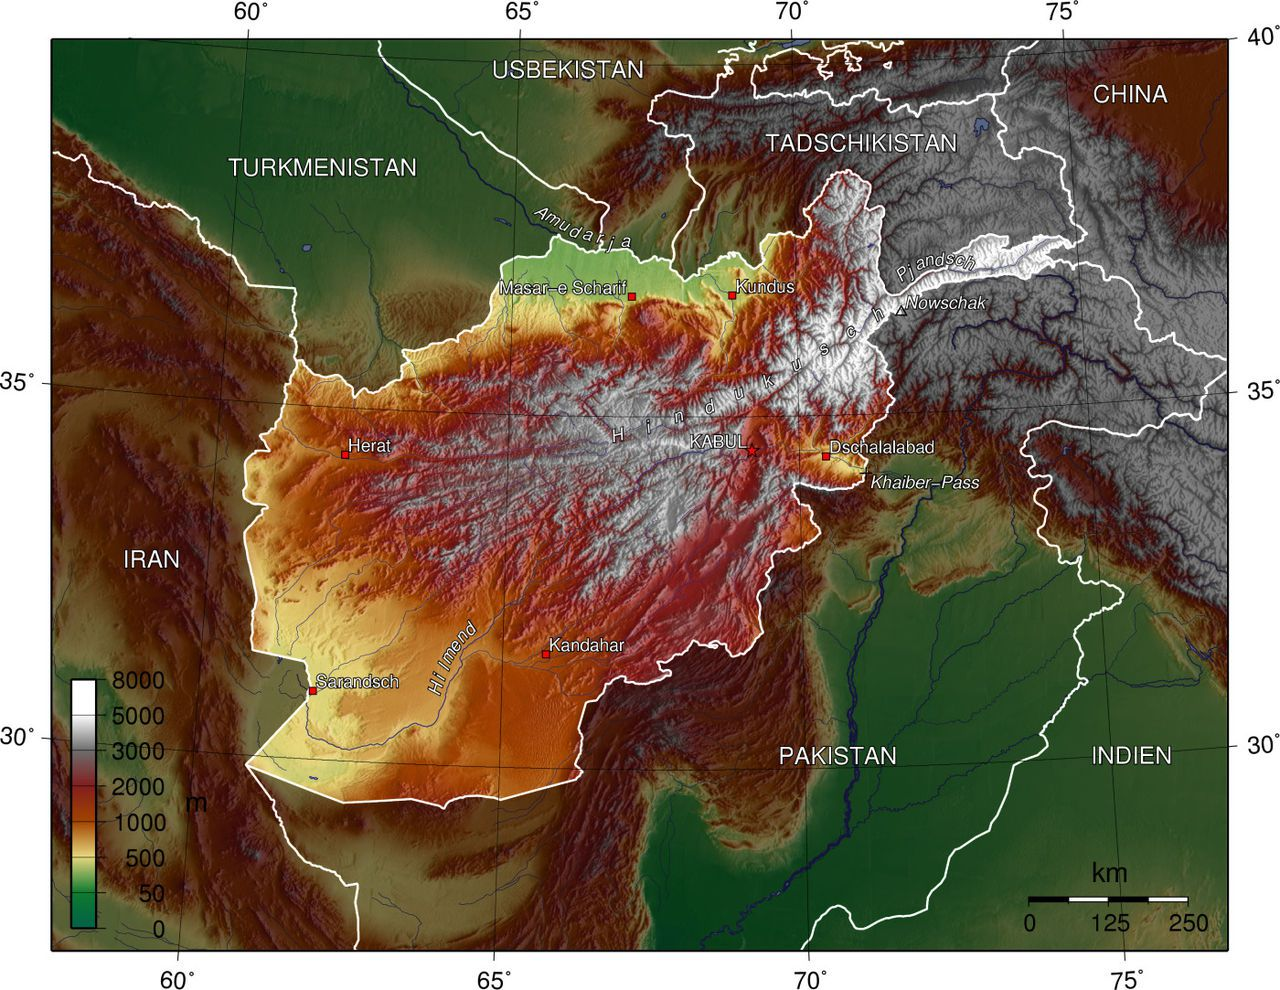 Carte du relief de l'Afghanistan